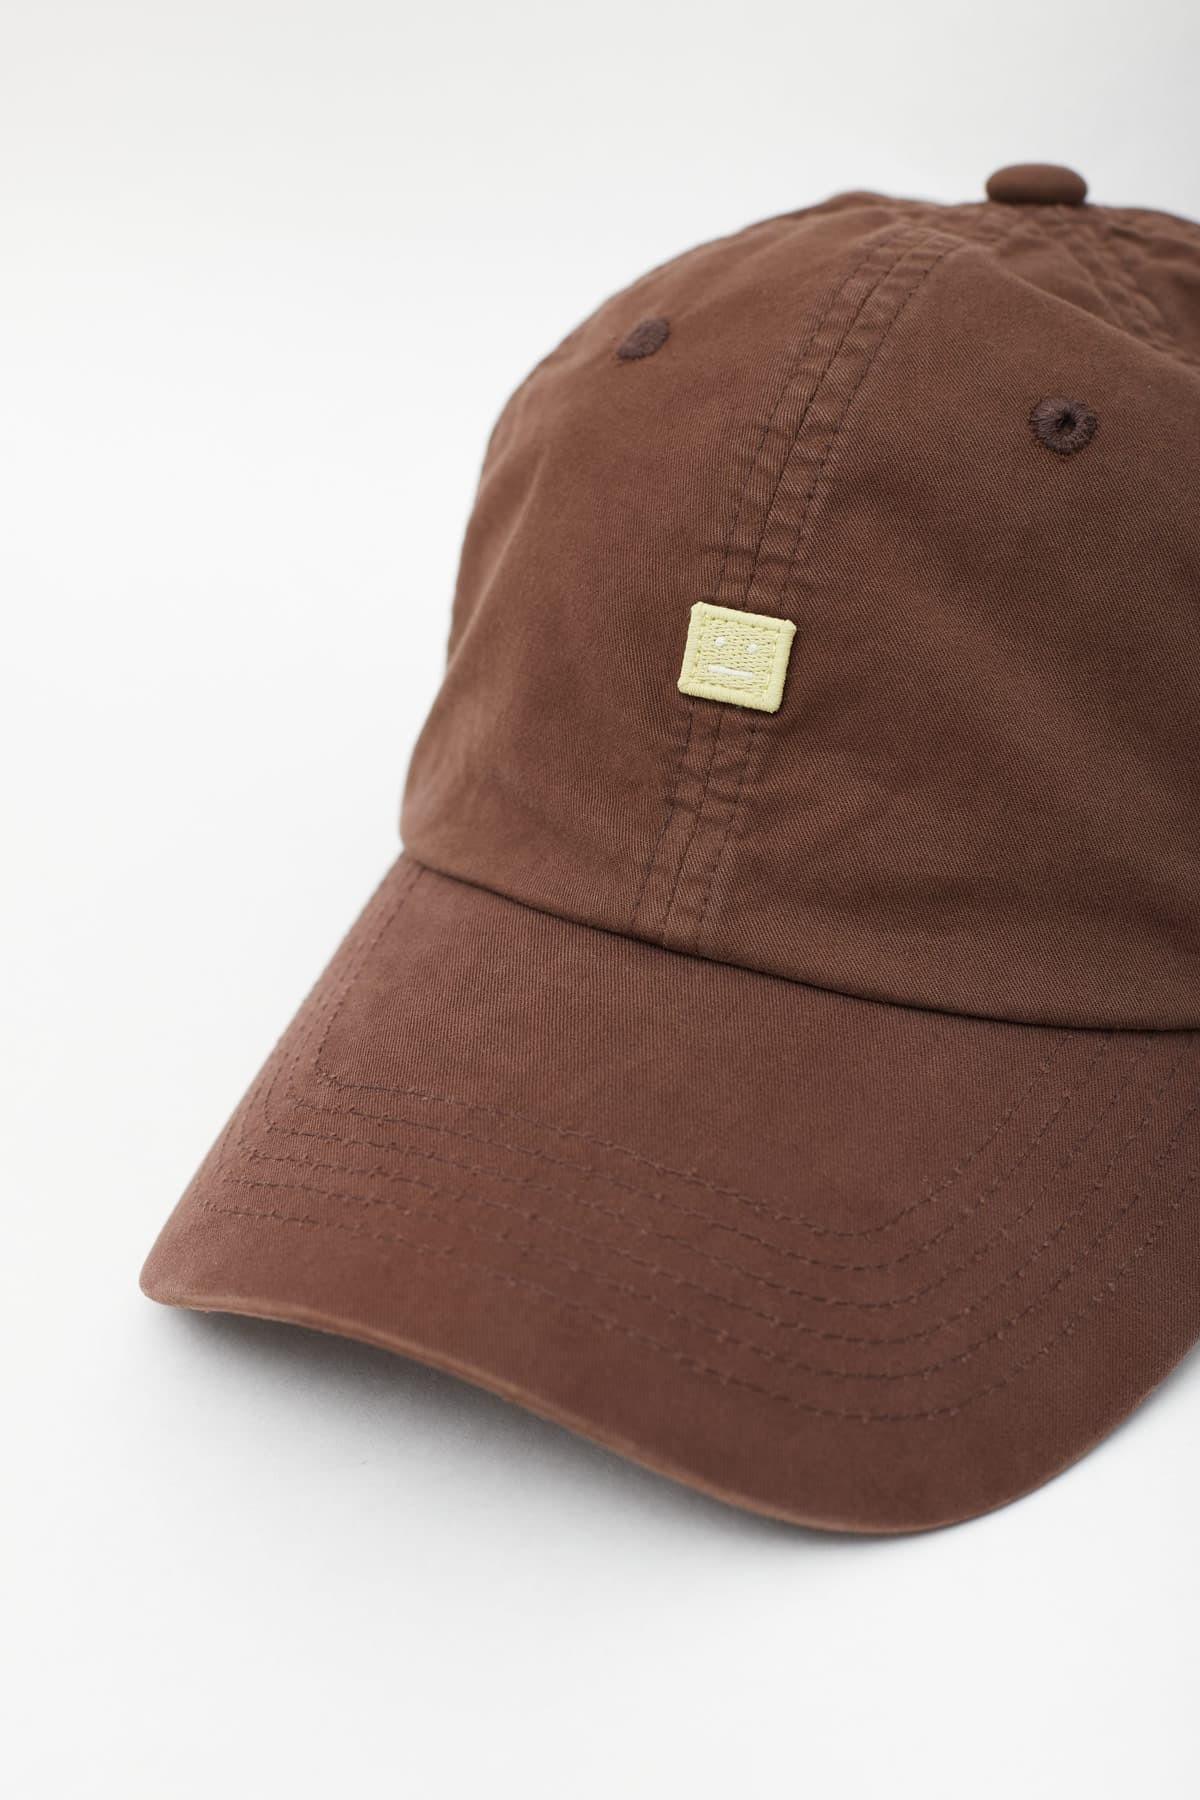 Shop CMMN SWDN Black Ridley T-Shirt